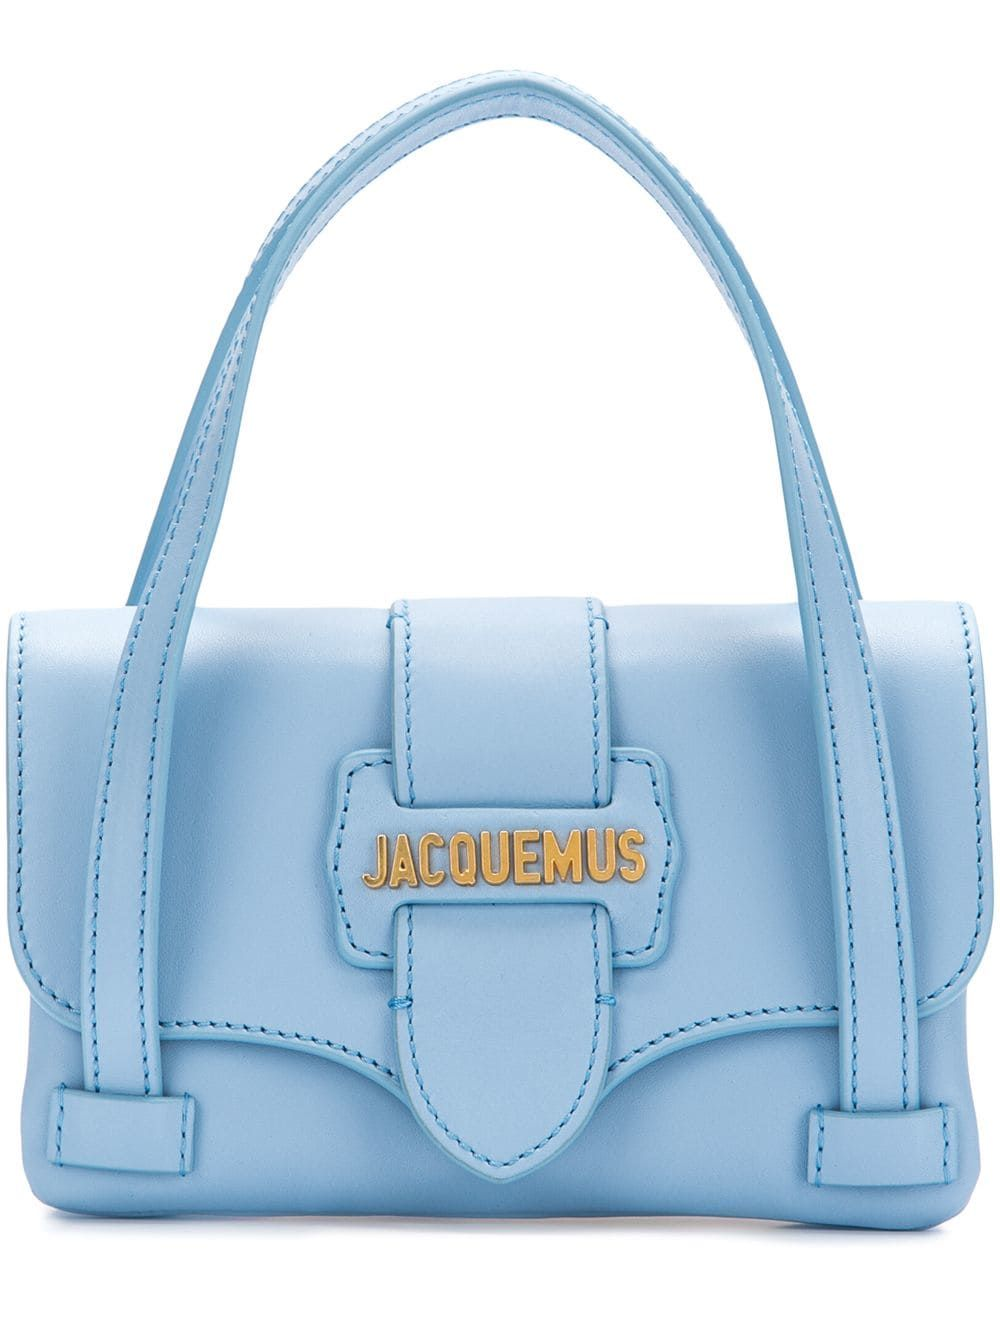 Jacquemus micro bag